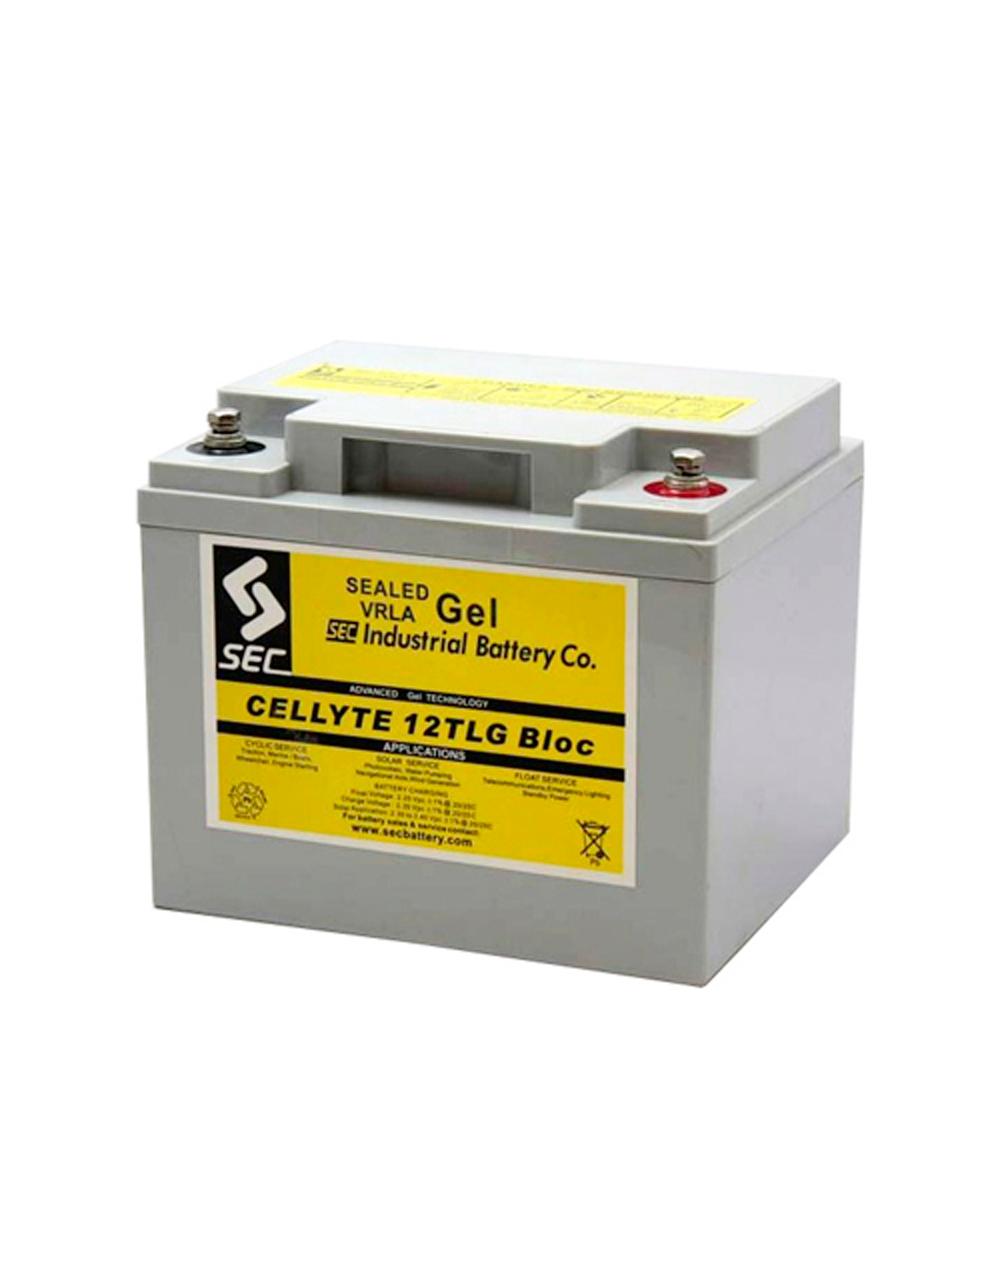 Sec TLG 40AH Full Gel Battery - Top Caddy